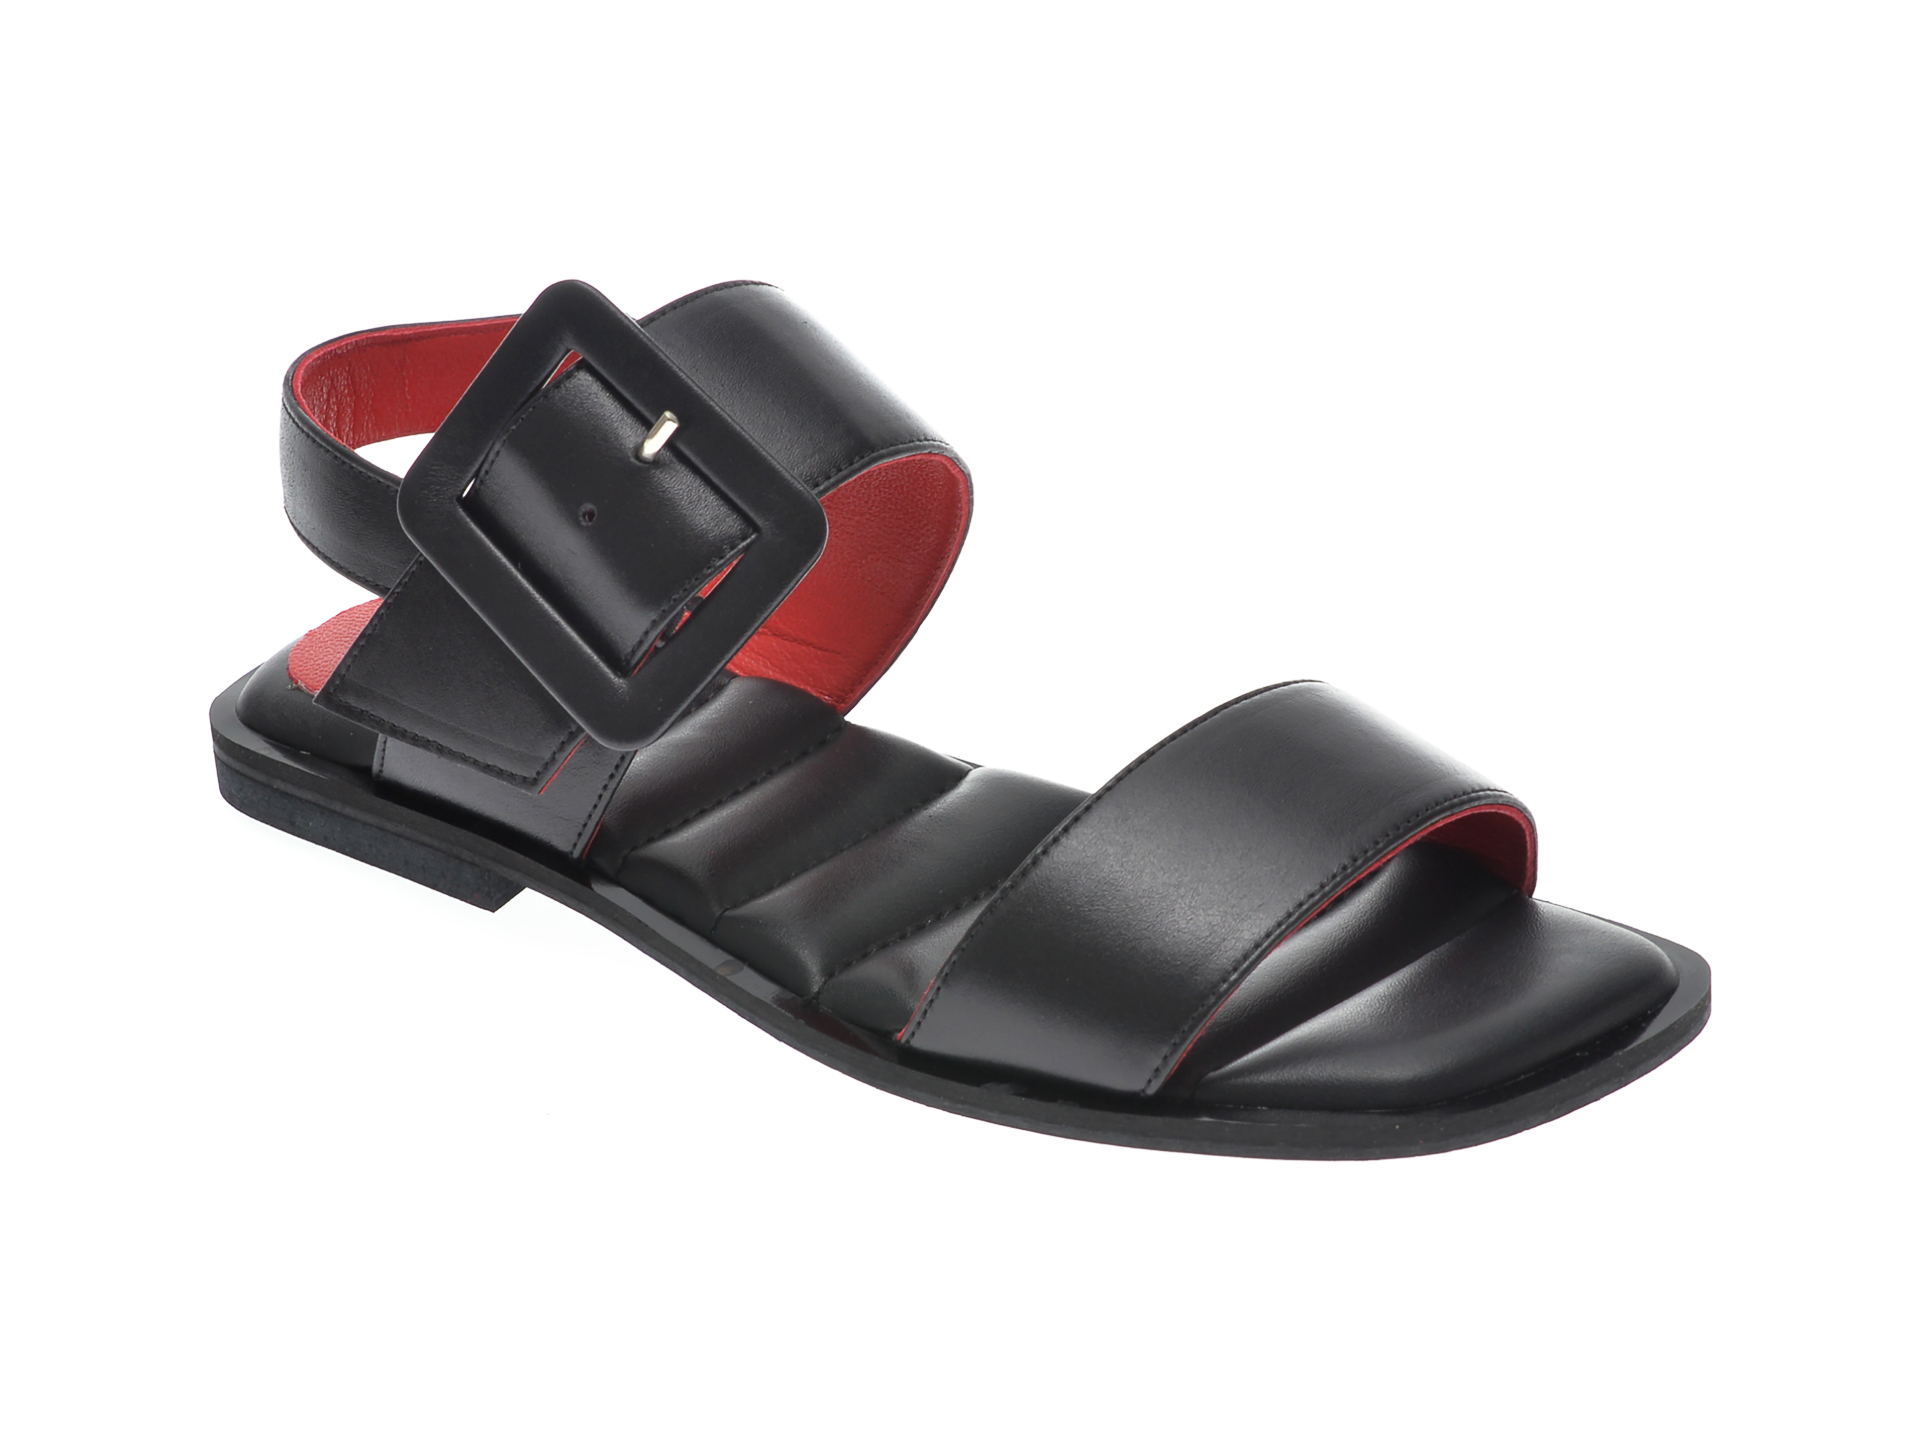 Sandale UNICA negre, A6419, din piele naturala